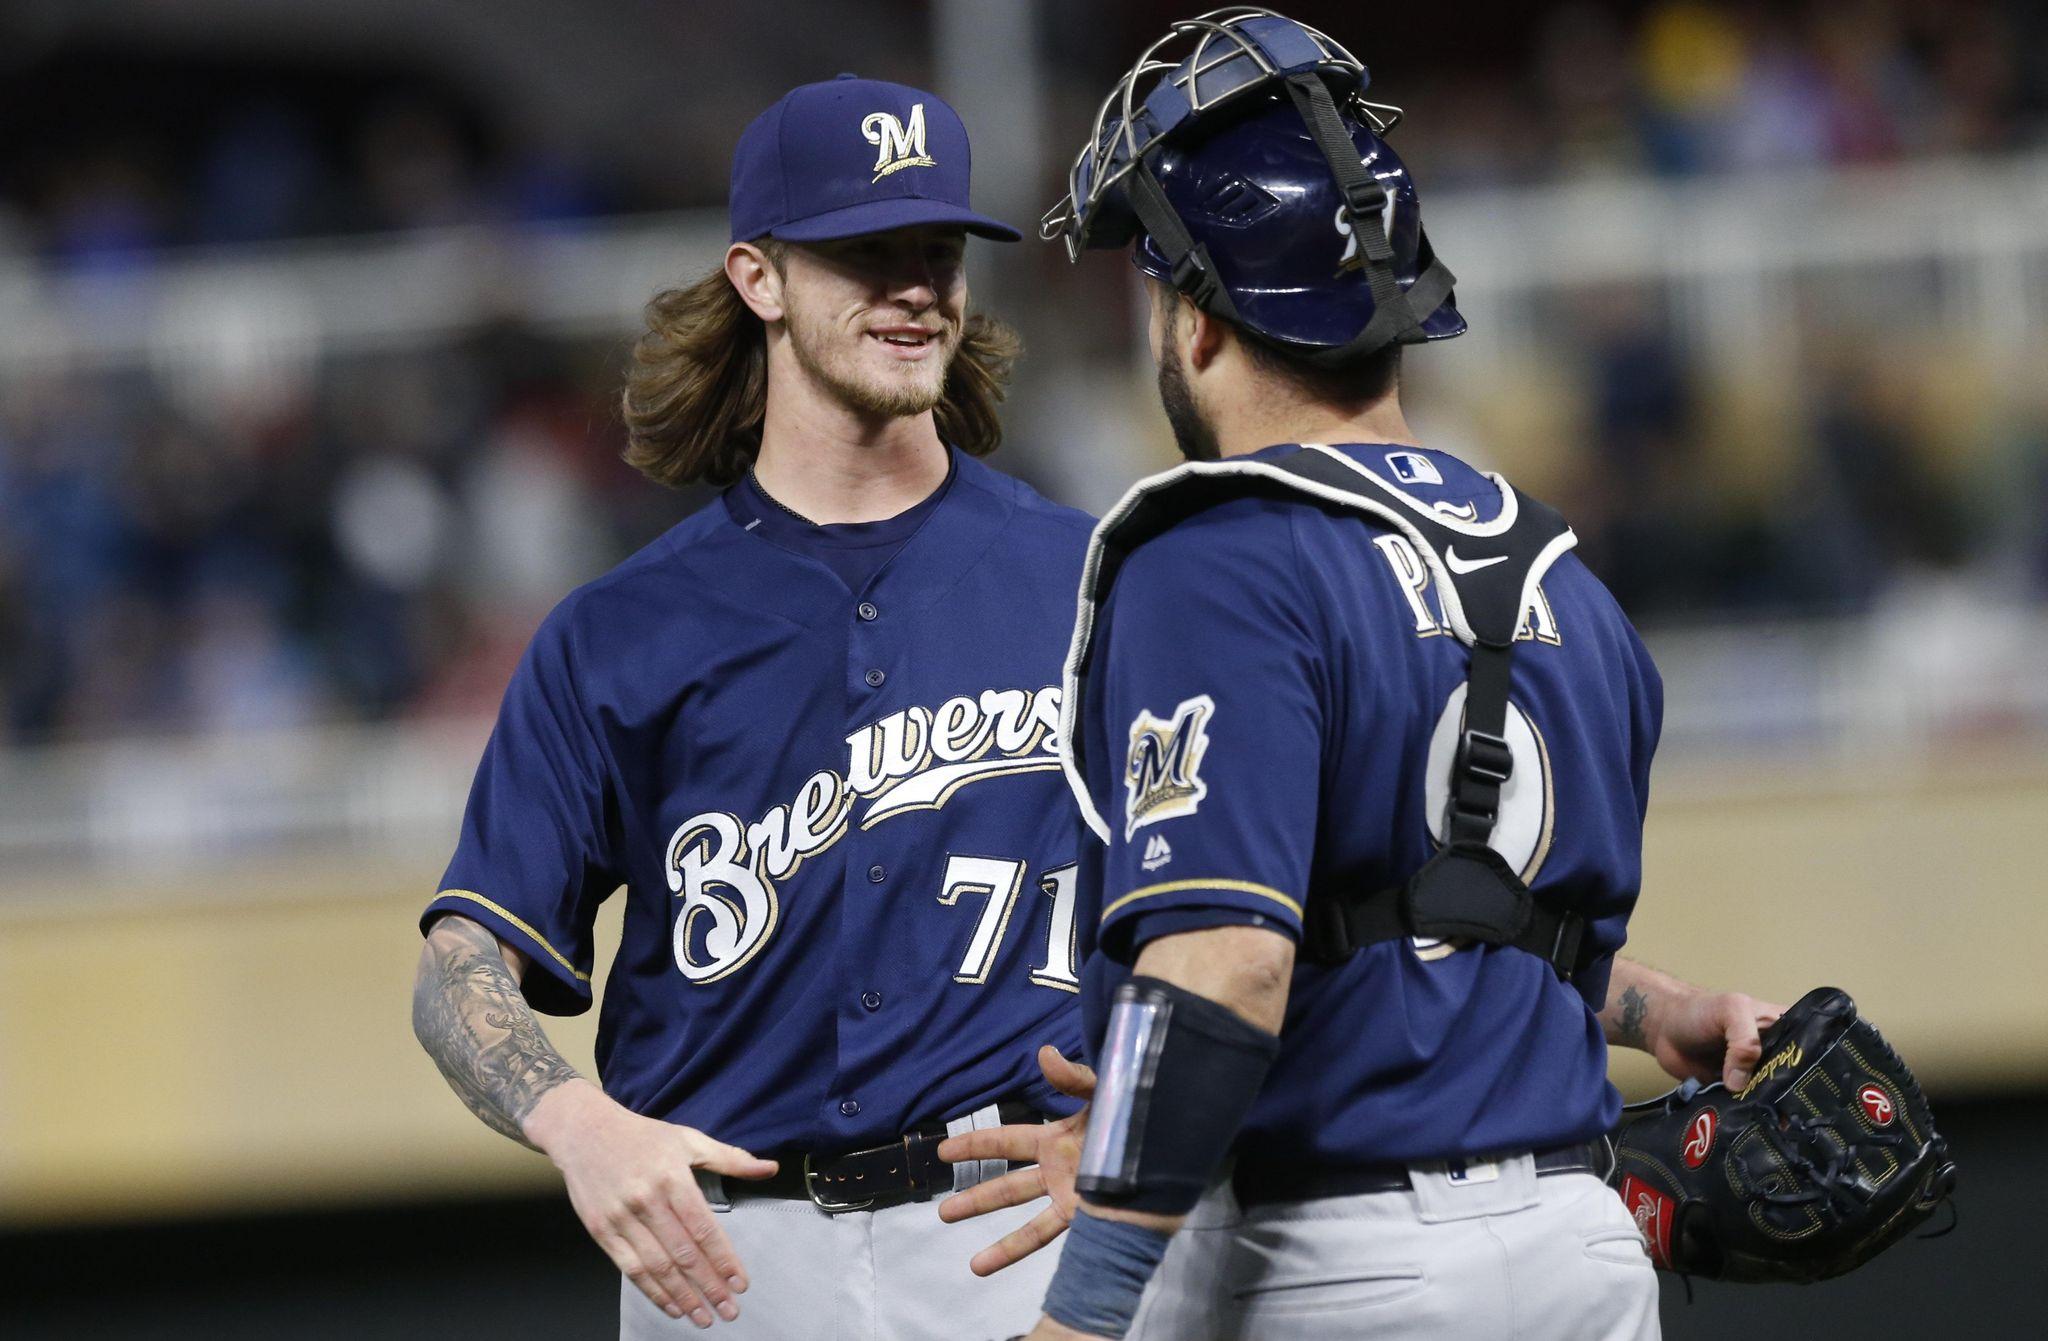 Brewers_twins_baseball_11293_s2048x1341